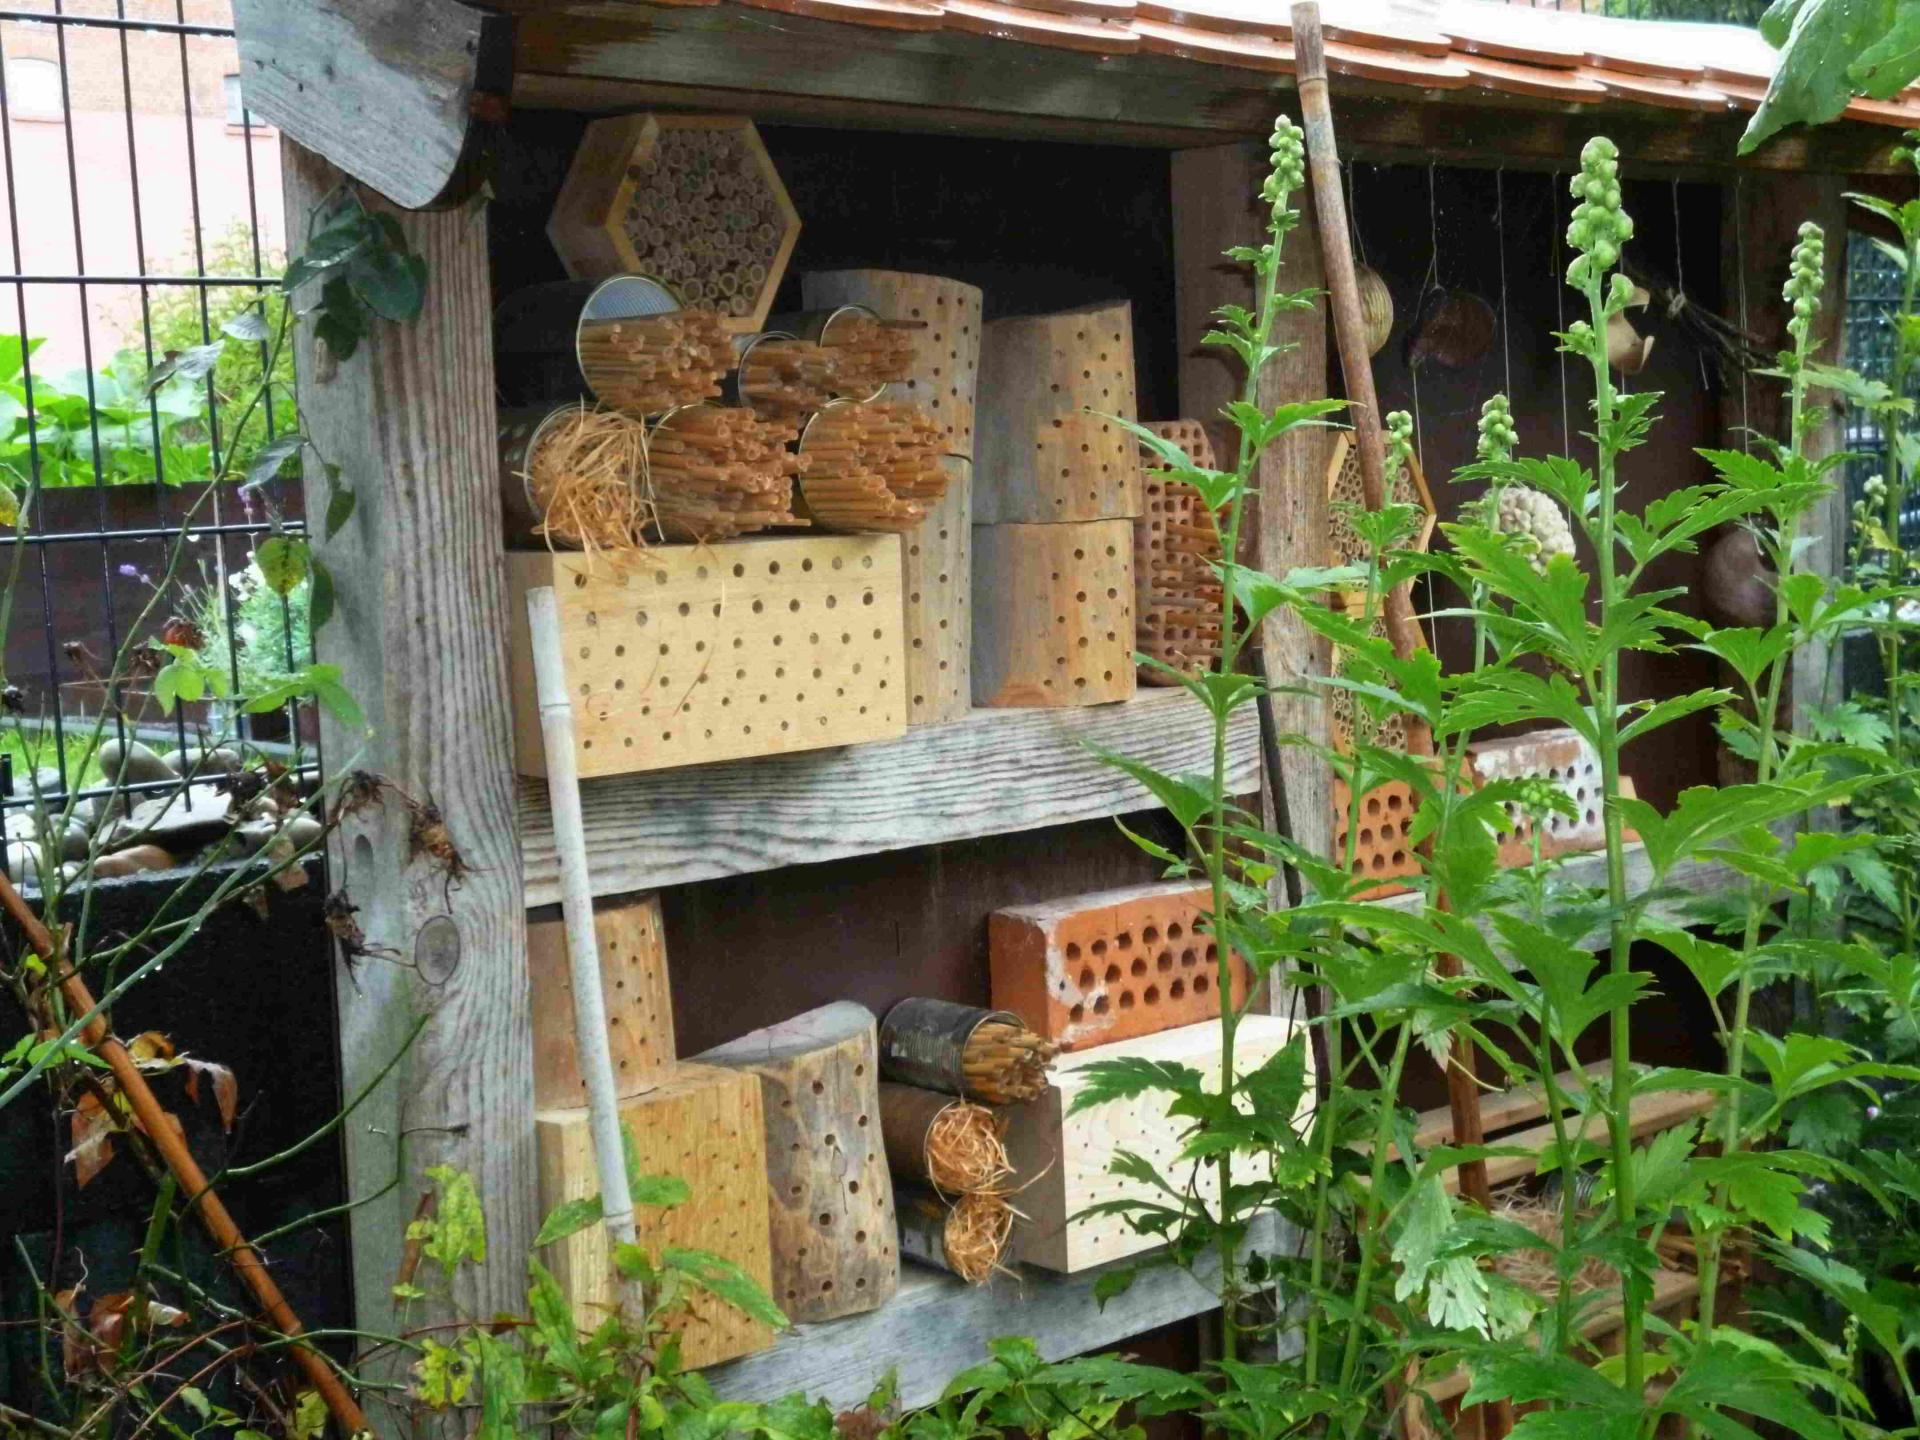 Offene Gartenpfporte 26-09-2020 Bild 12